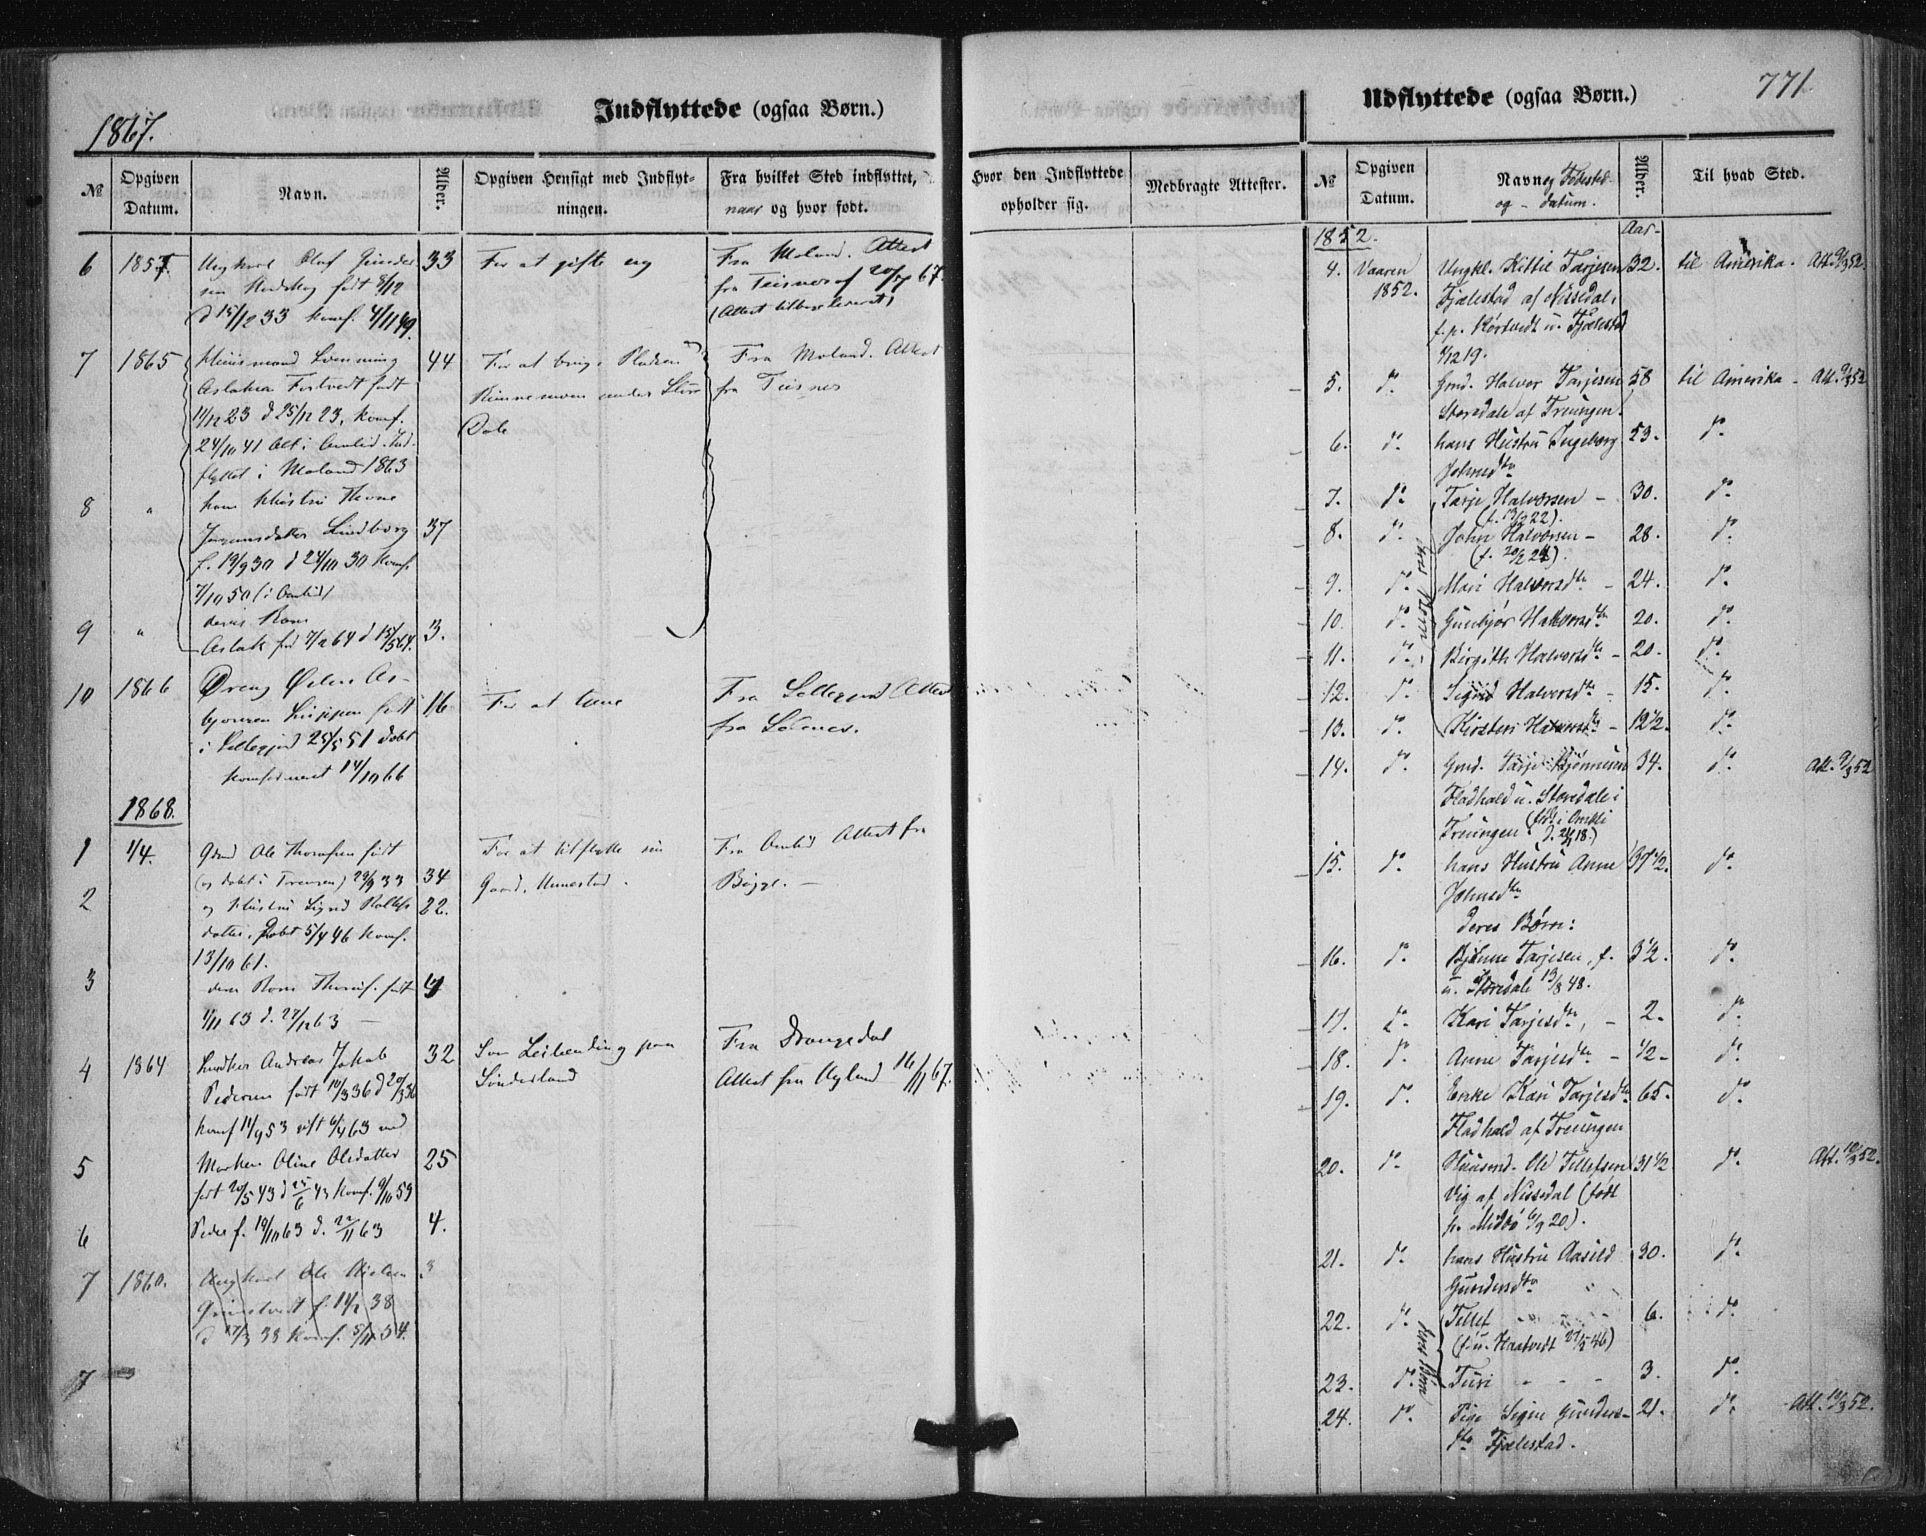 SAKO, Nissedal kirkebøker, F/Fa/L0003: Ministerialbok nr. I 3, 1846-1870, s. 770-771